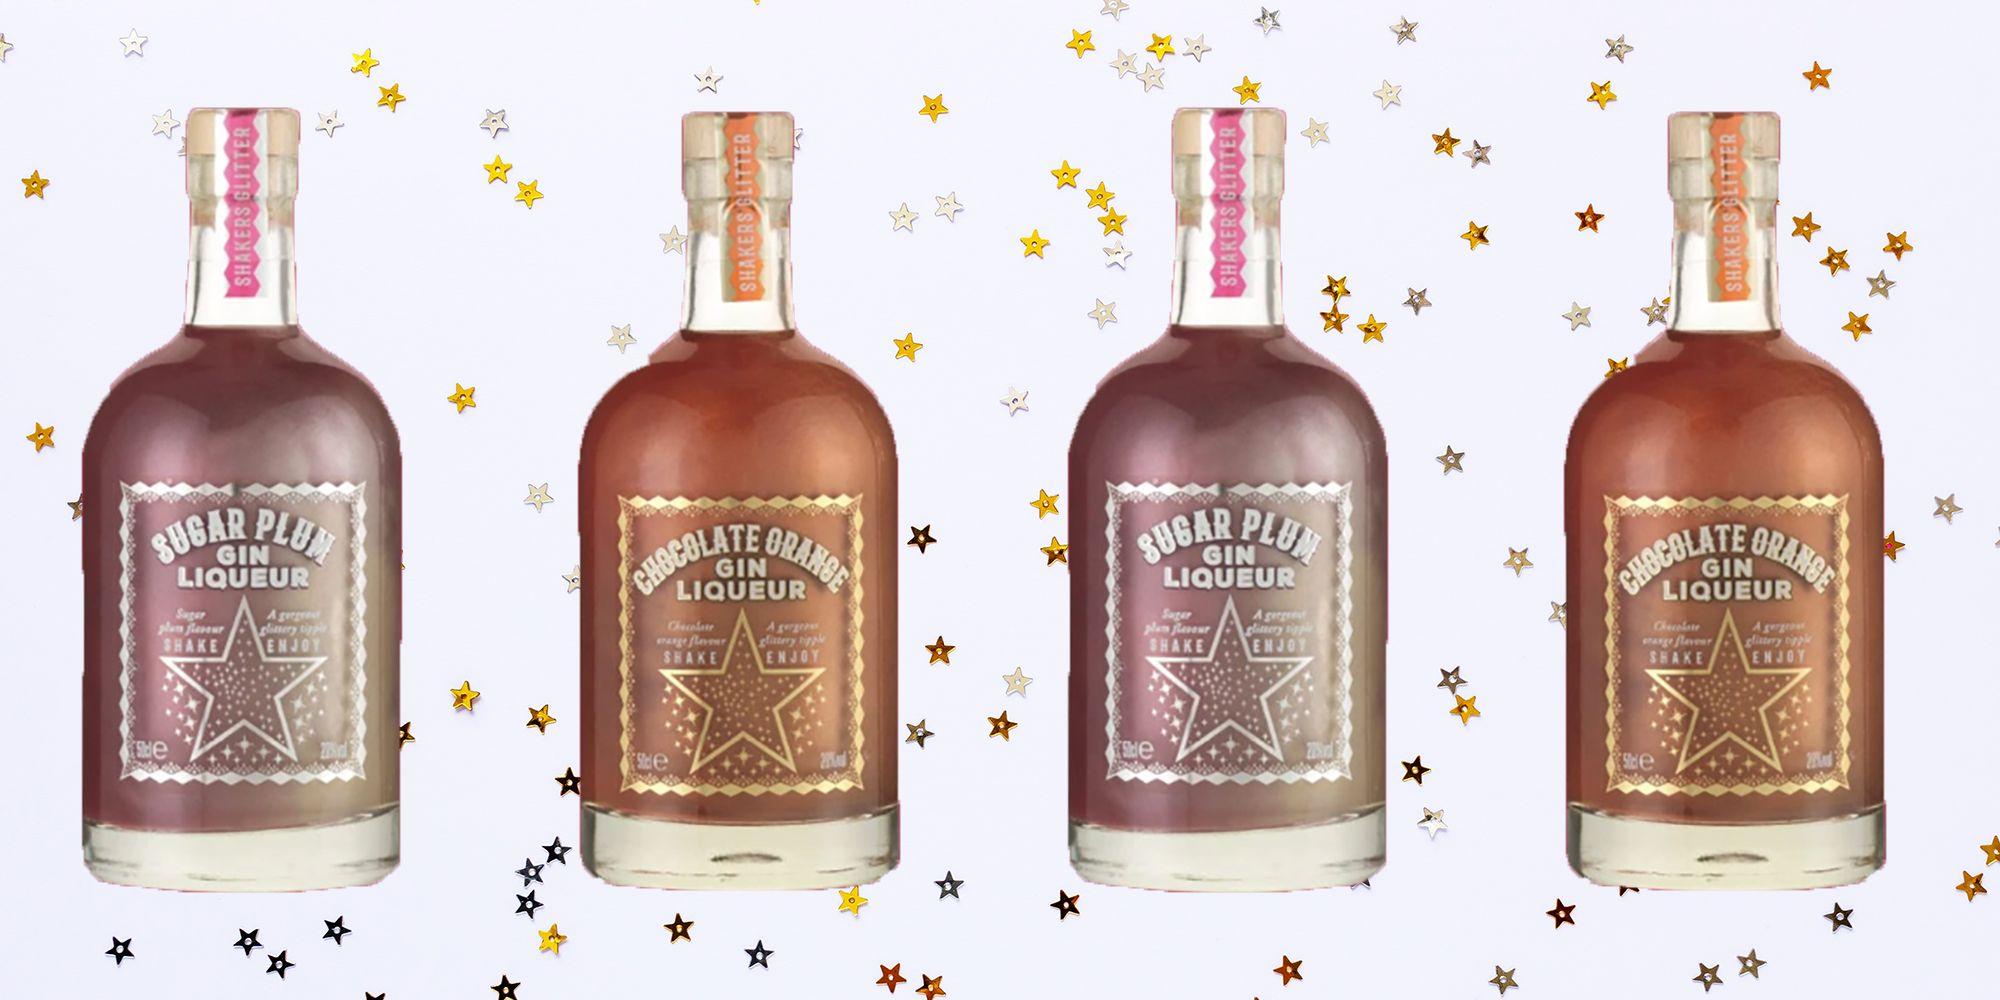 Sainsbury's Is Selling Glittery Sugar Plum and Chocolate Orange Gin Liqueurs